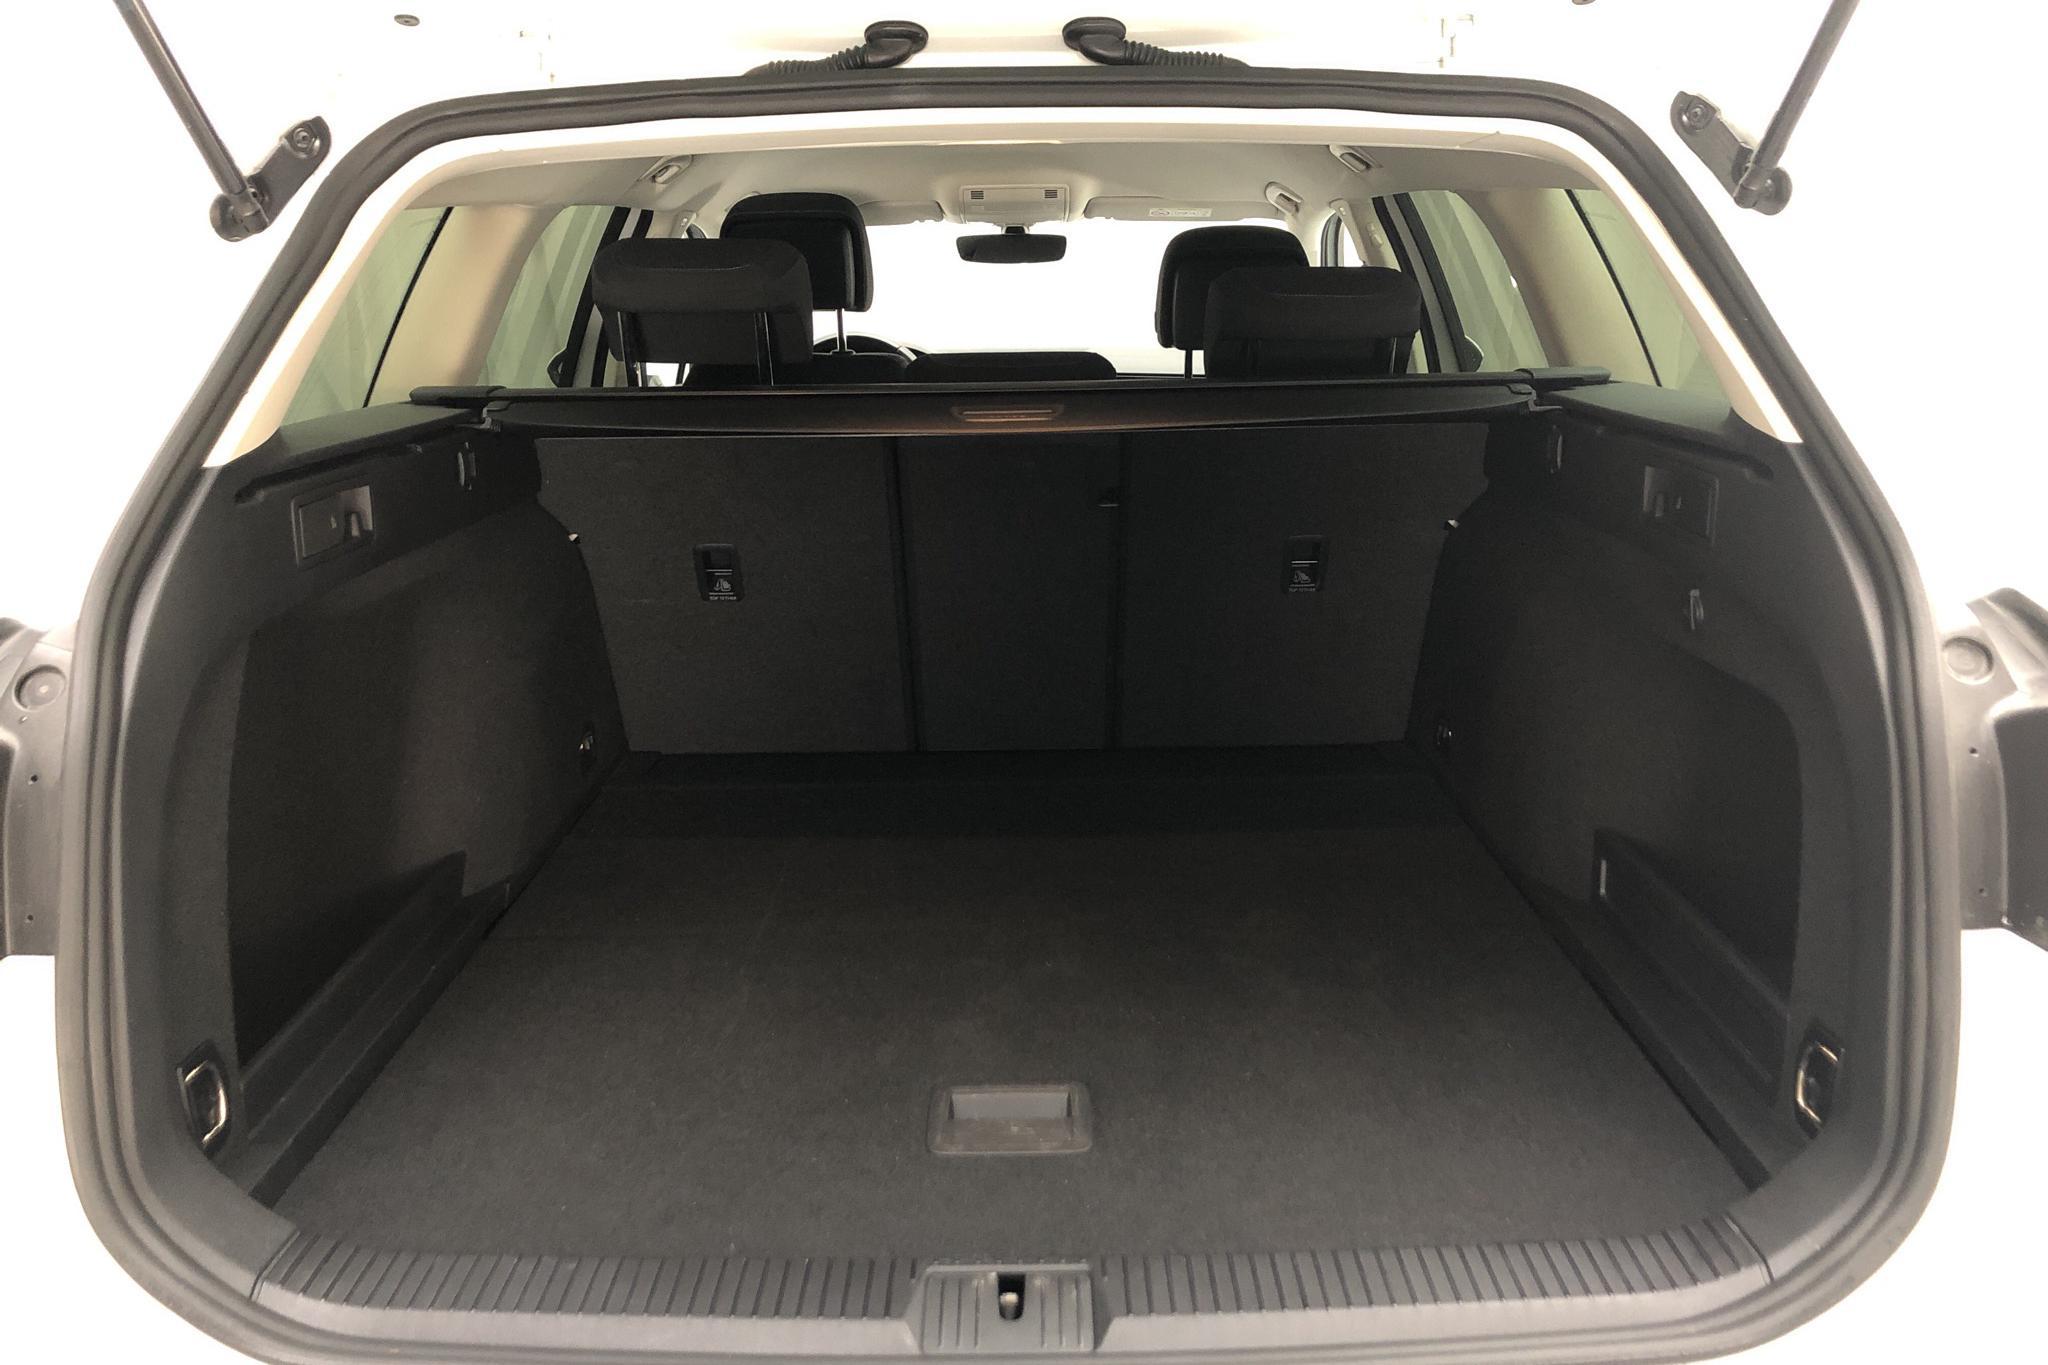 VW Passat 1.4 TSI Sportscombi (150hk) - 5 754 mil - Manuell - vit - 2018